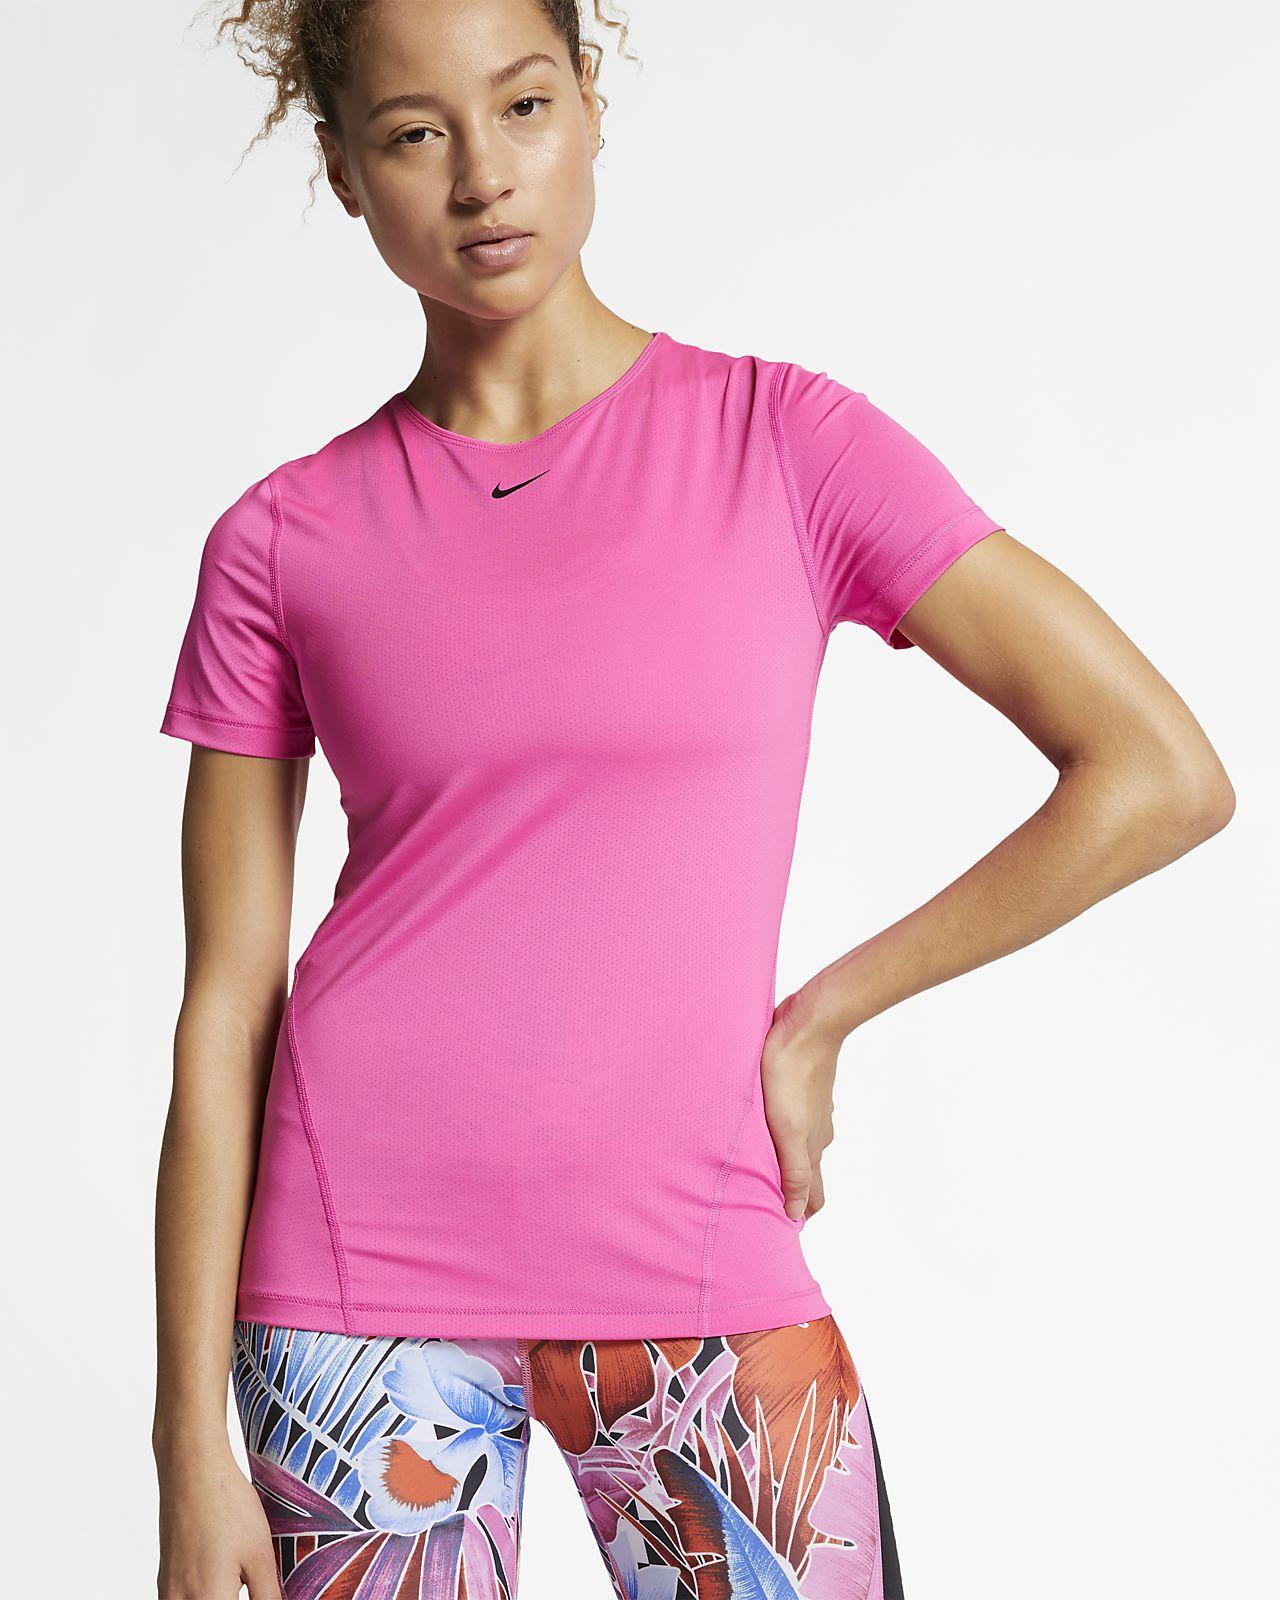 6c0978ba7314 Nike Pro Women s Short-Sleeve Mesh Training Top. Nike.com AT